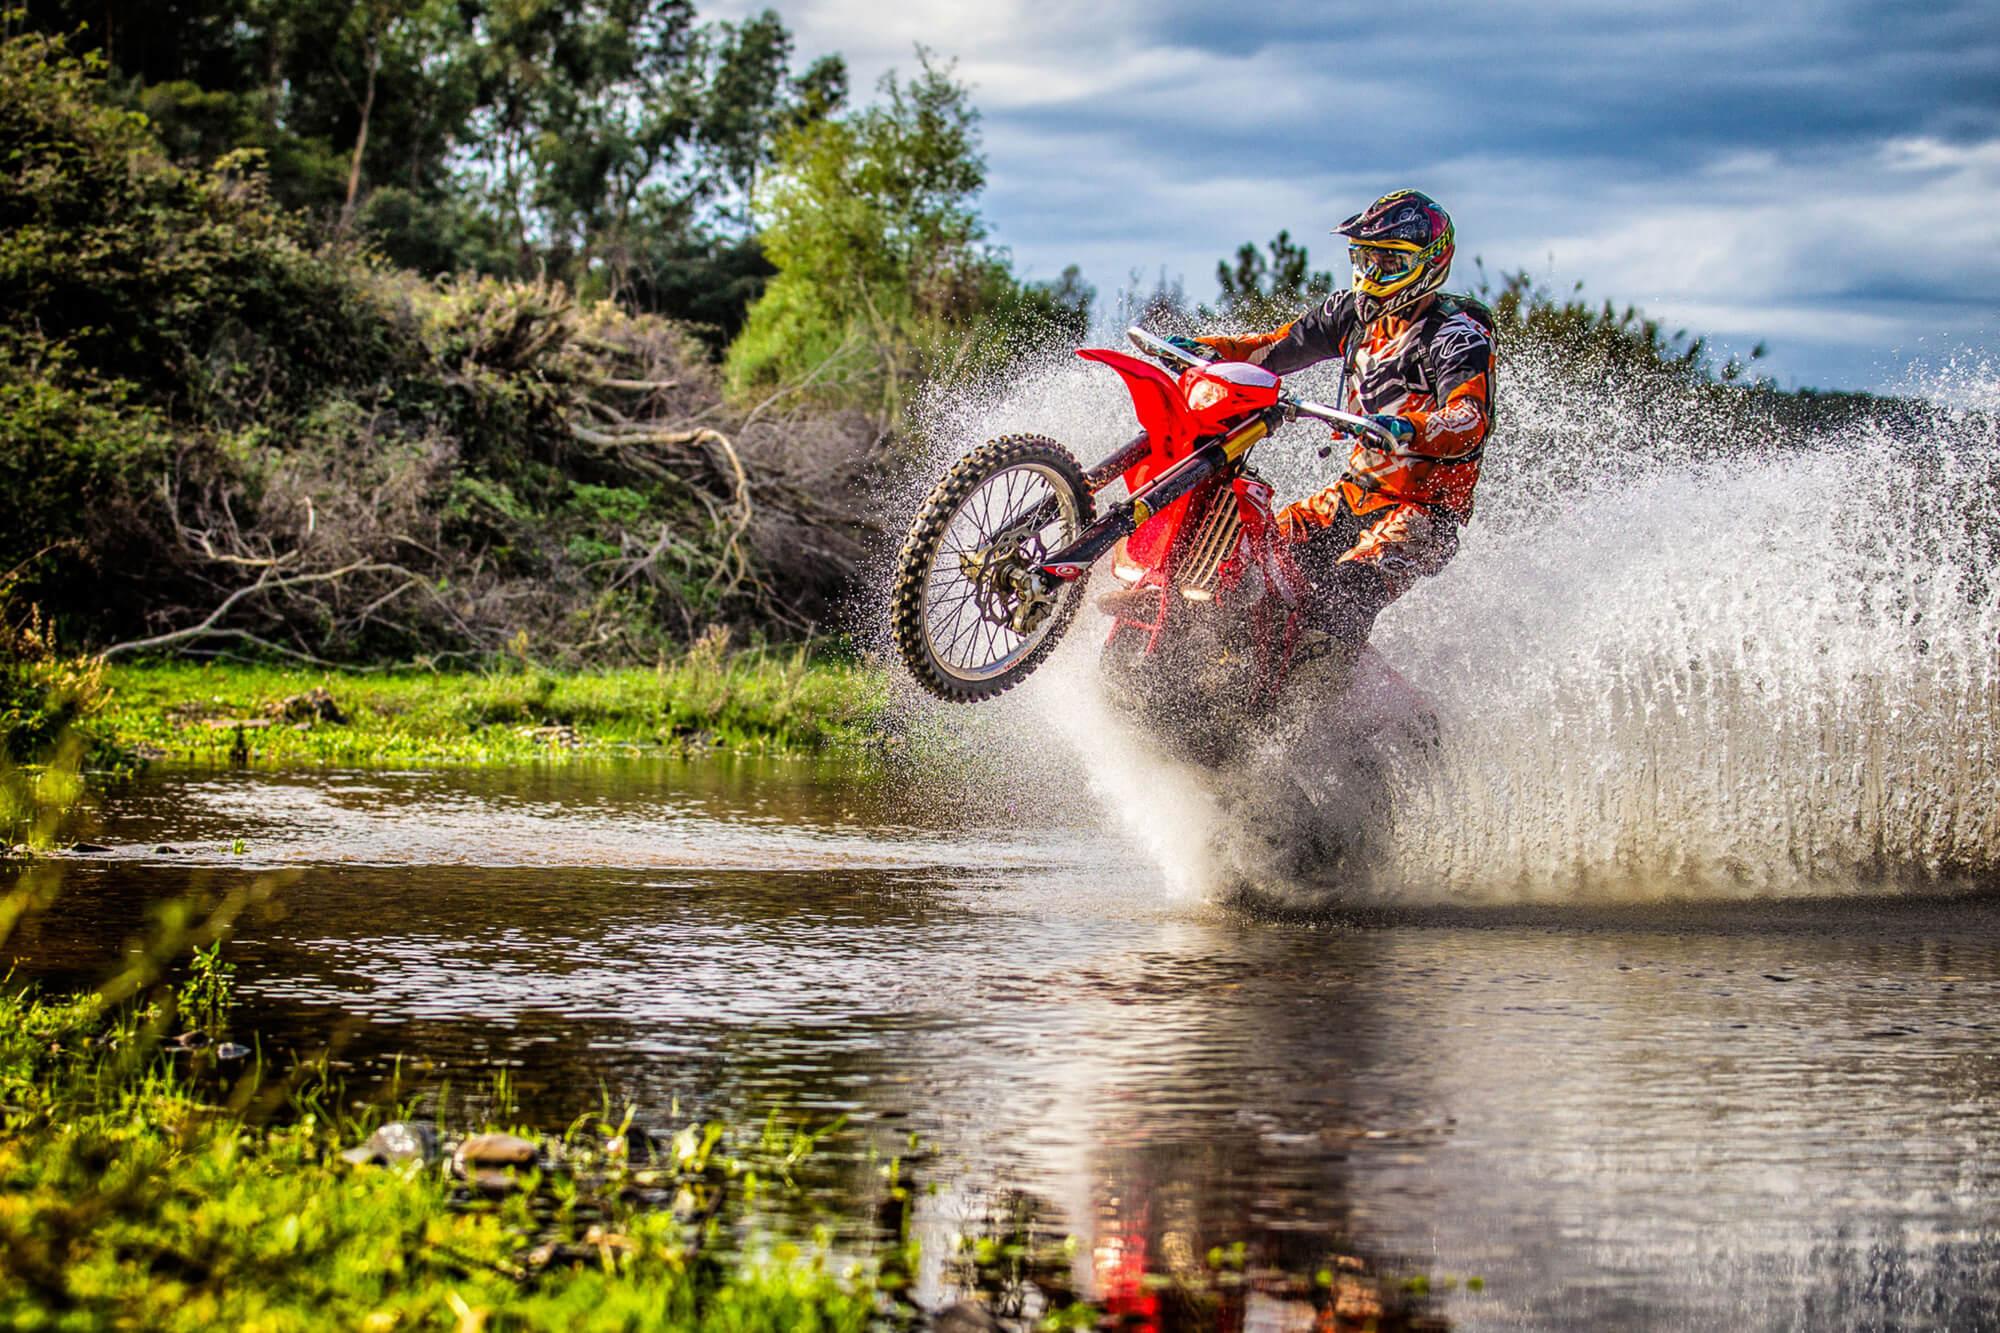 Motocross Shooting in Portugal